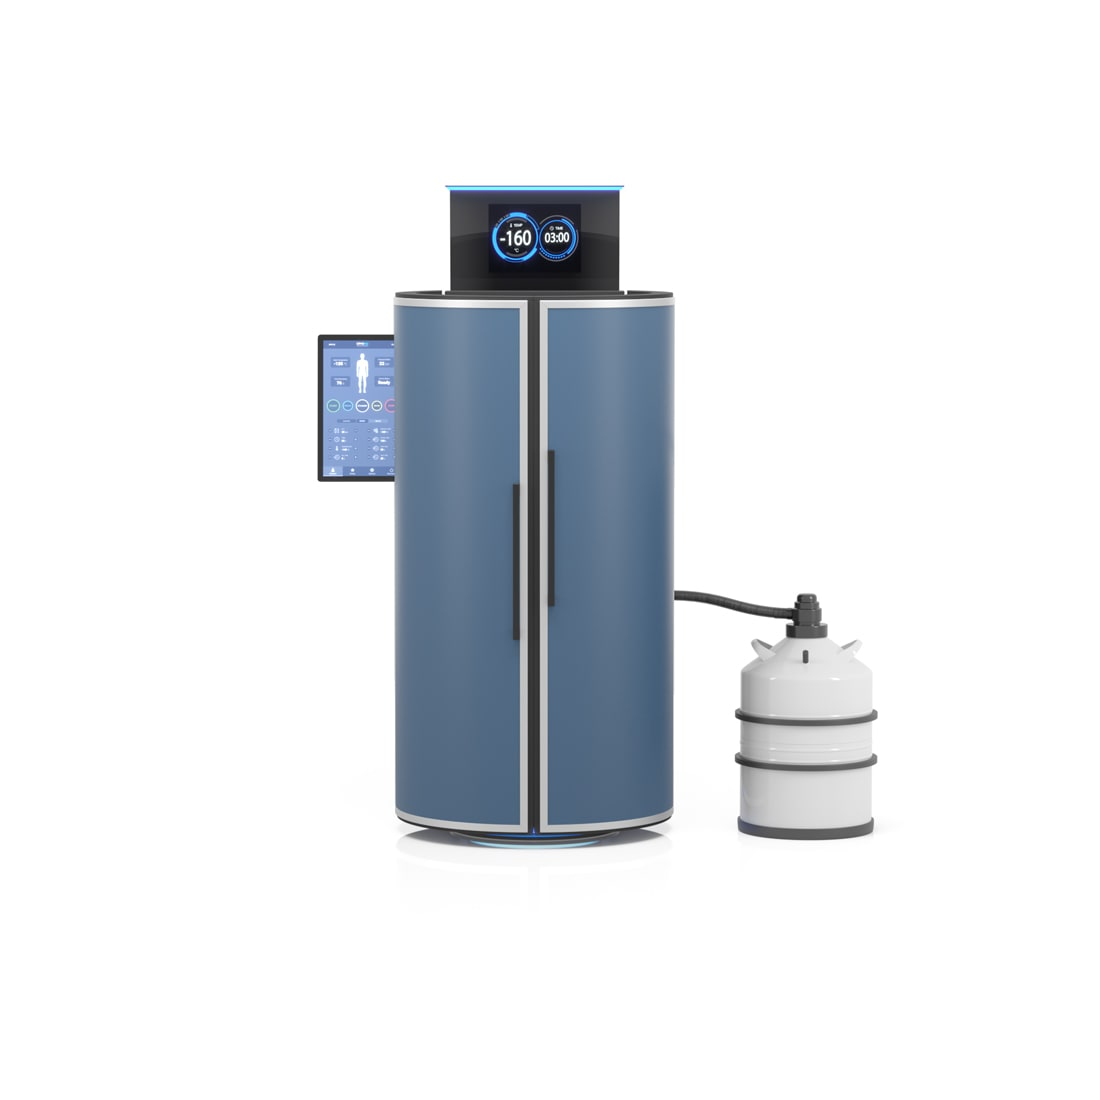 Cryotherapy machine with non-pressurized storage tank